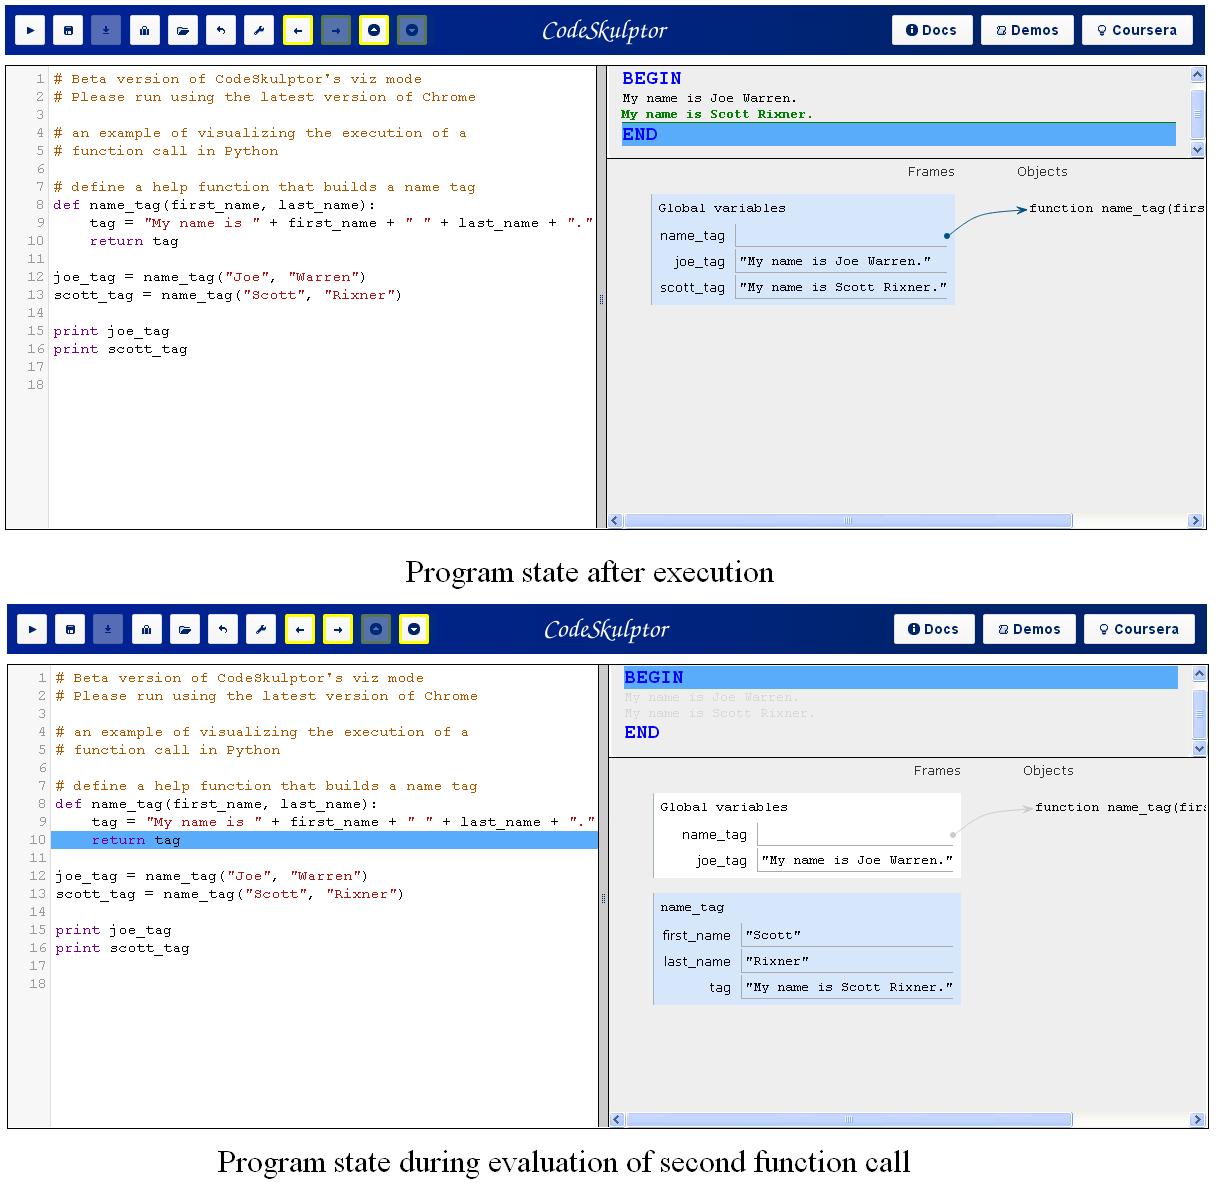 Visualizing program state